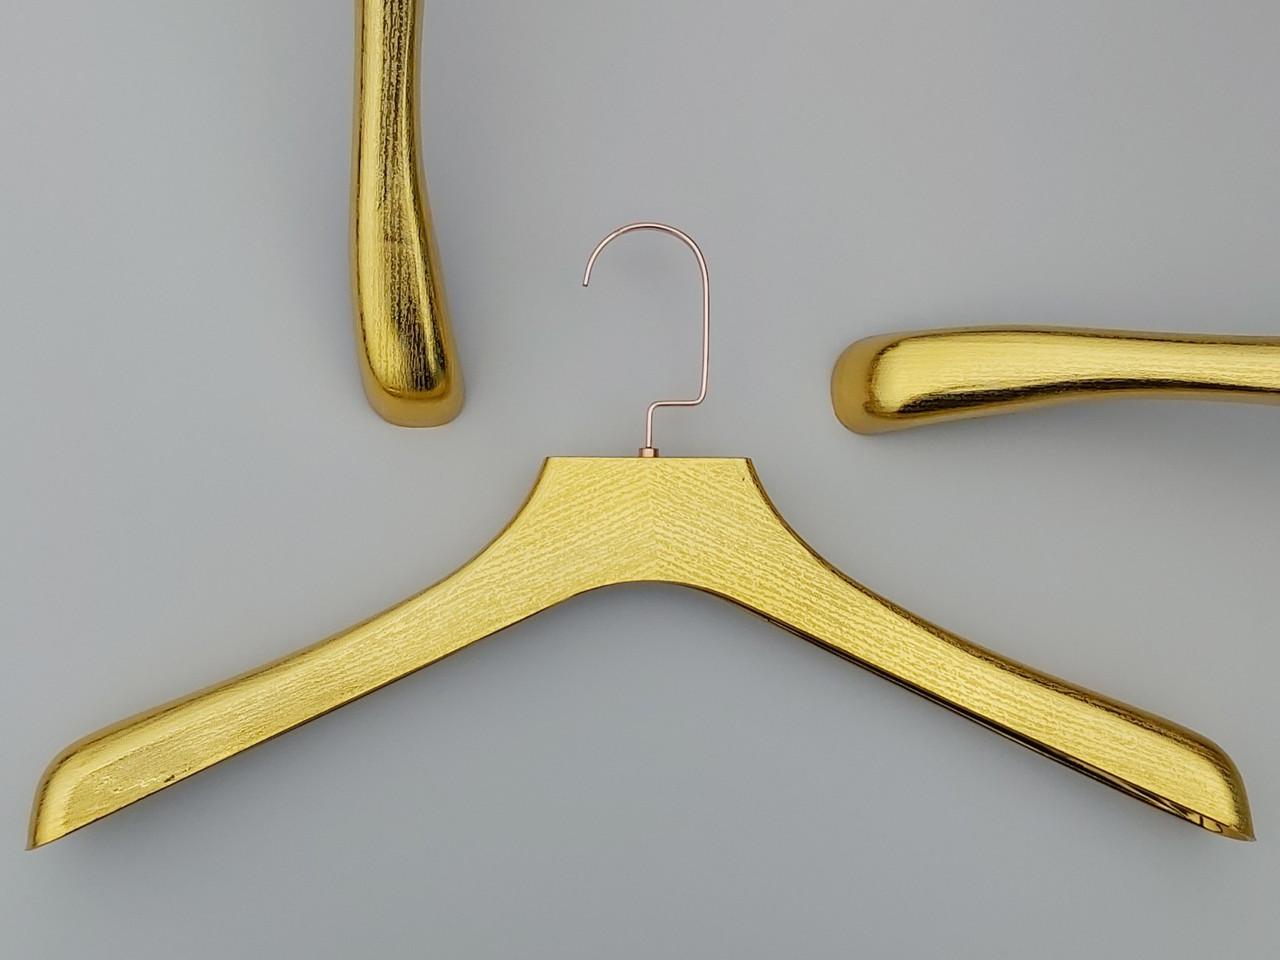 "Длина 44,5 см. Плечики вешалки пластмассовые широкие ""под дерево"" золотого цвета"